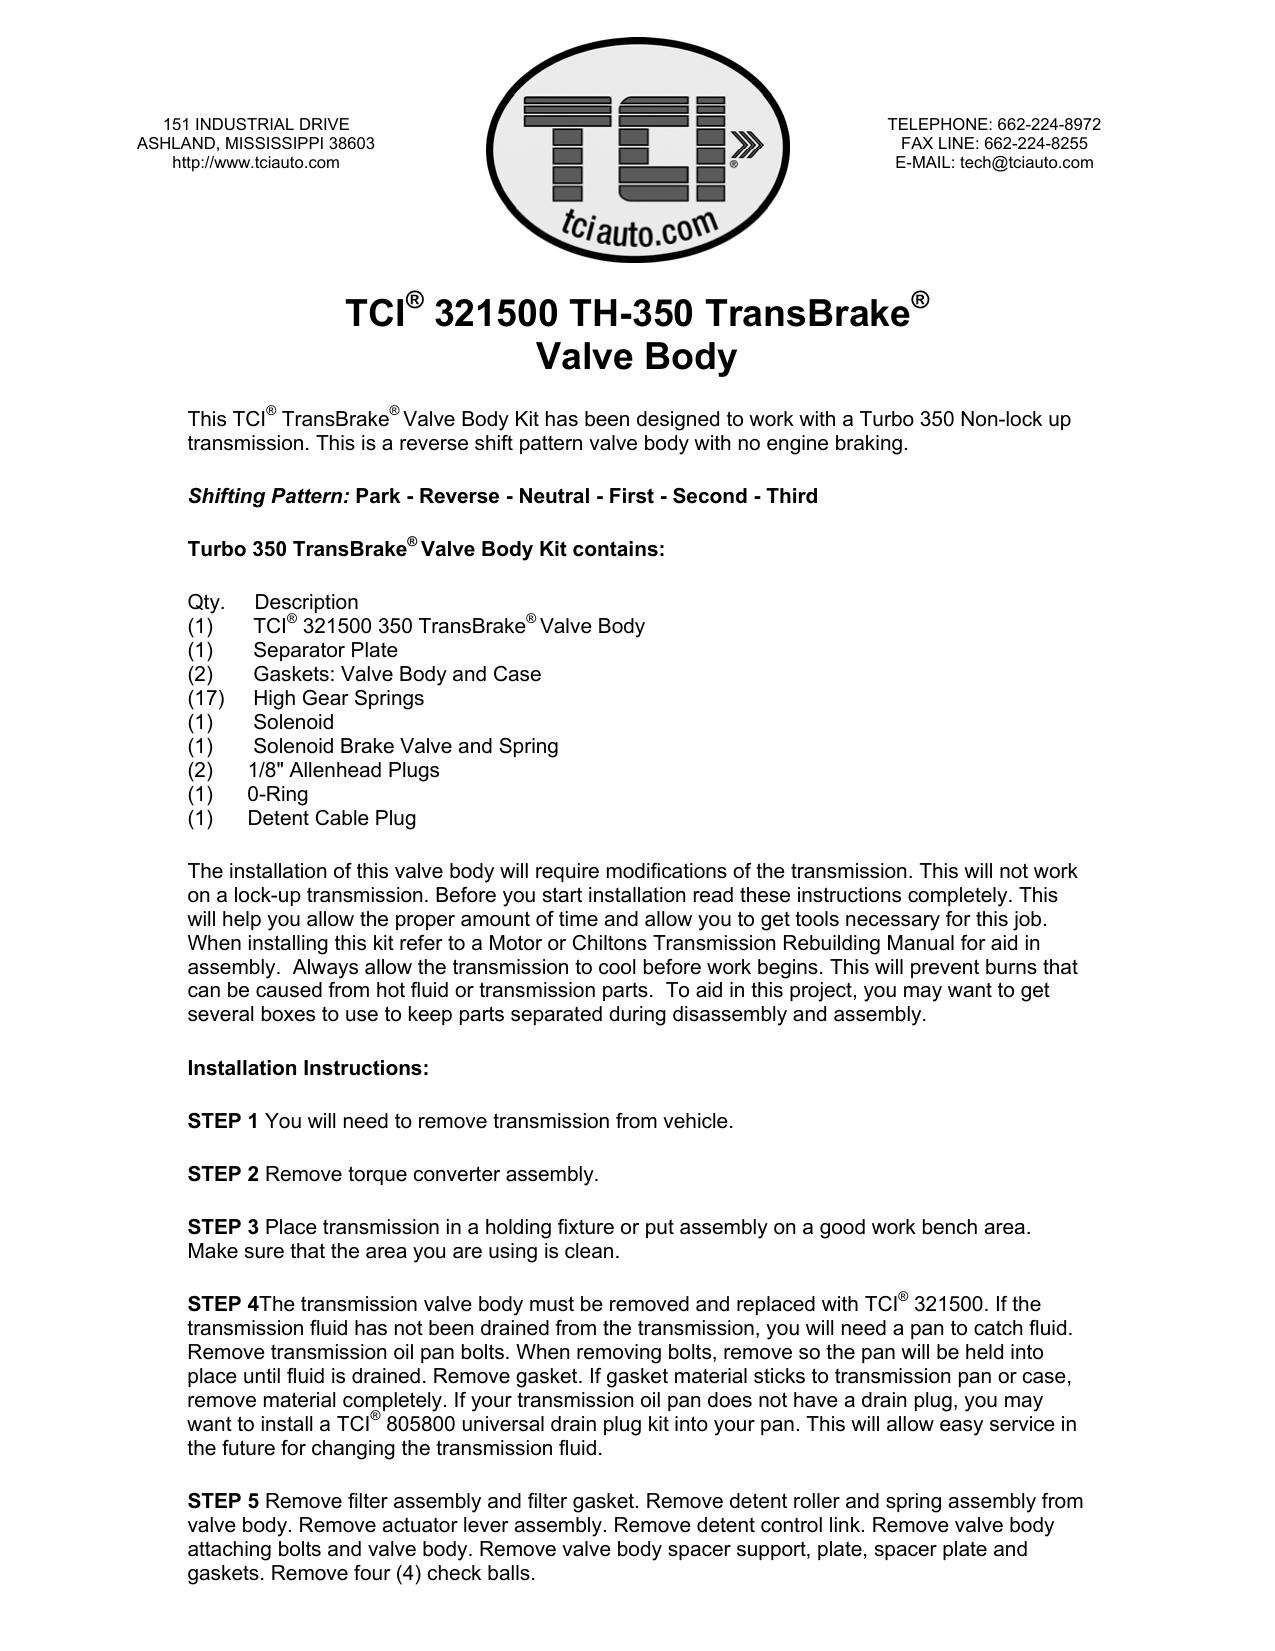 TCI® 321500 TransBrake Valve Body   manualzz com